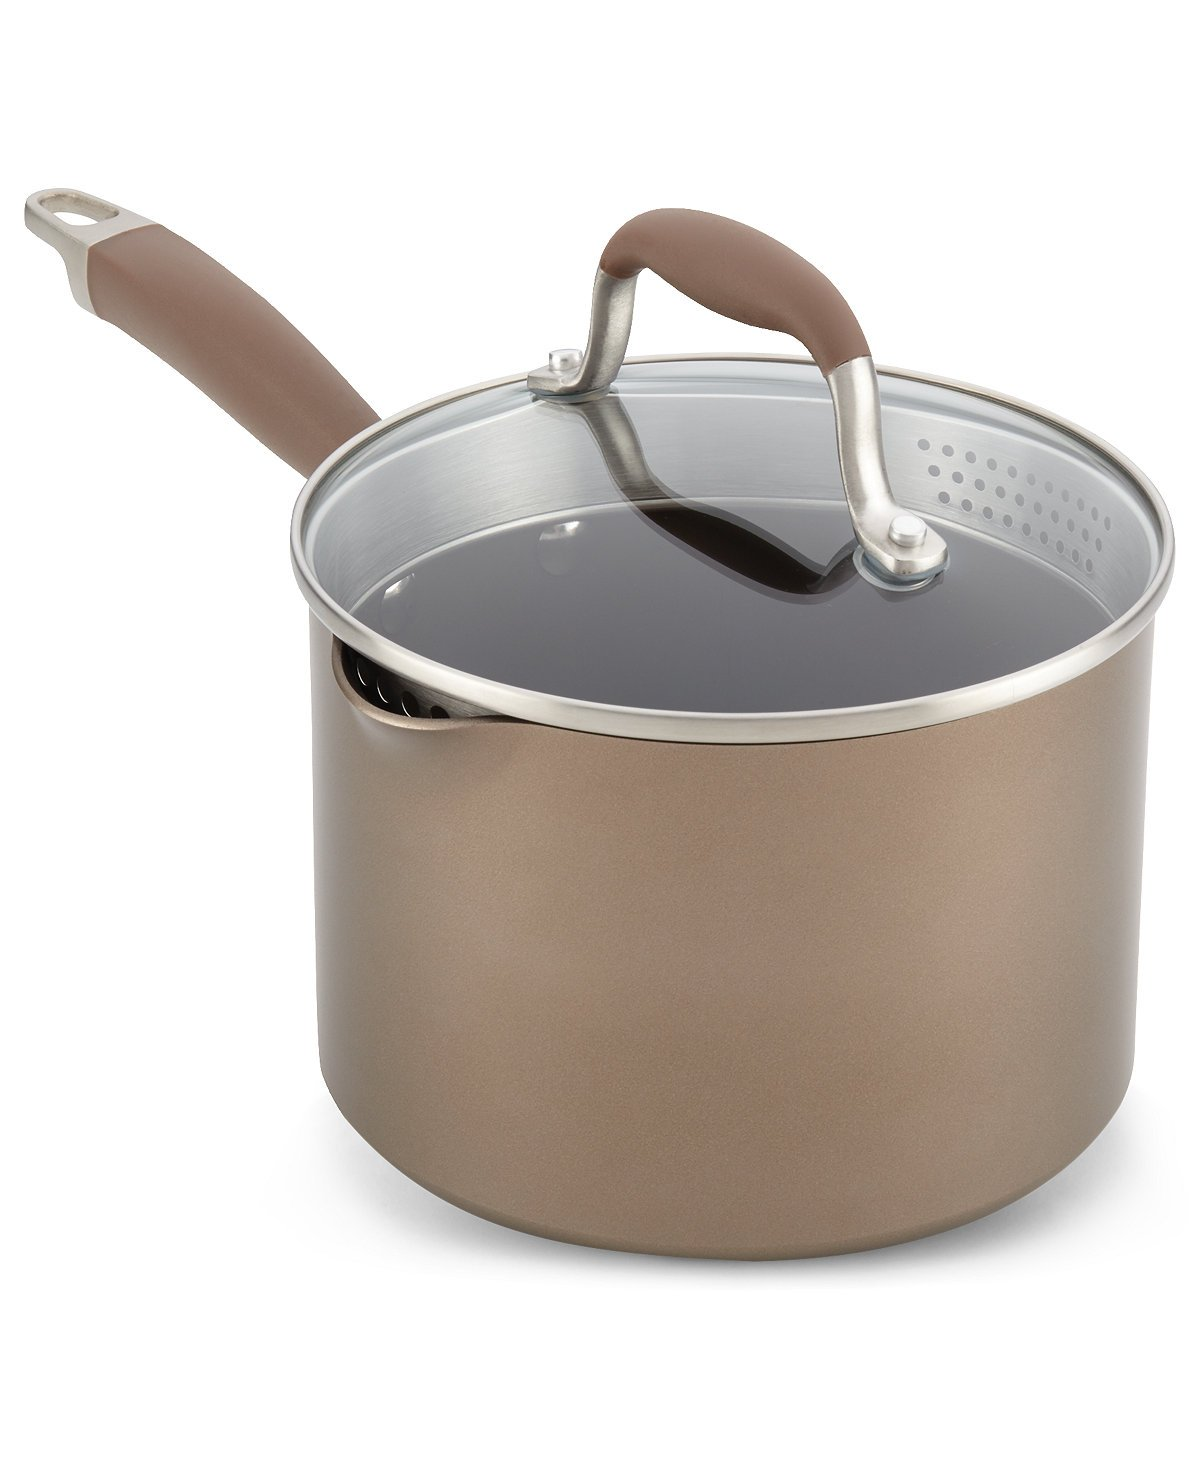 Anolon 84068 Nonstick Cookware Covered Straining Saucepan, Small, Bronze